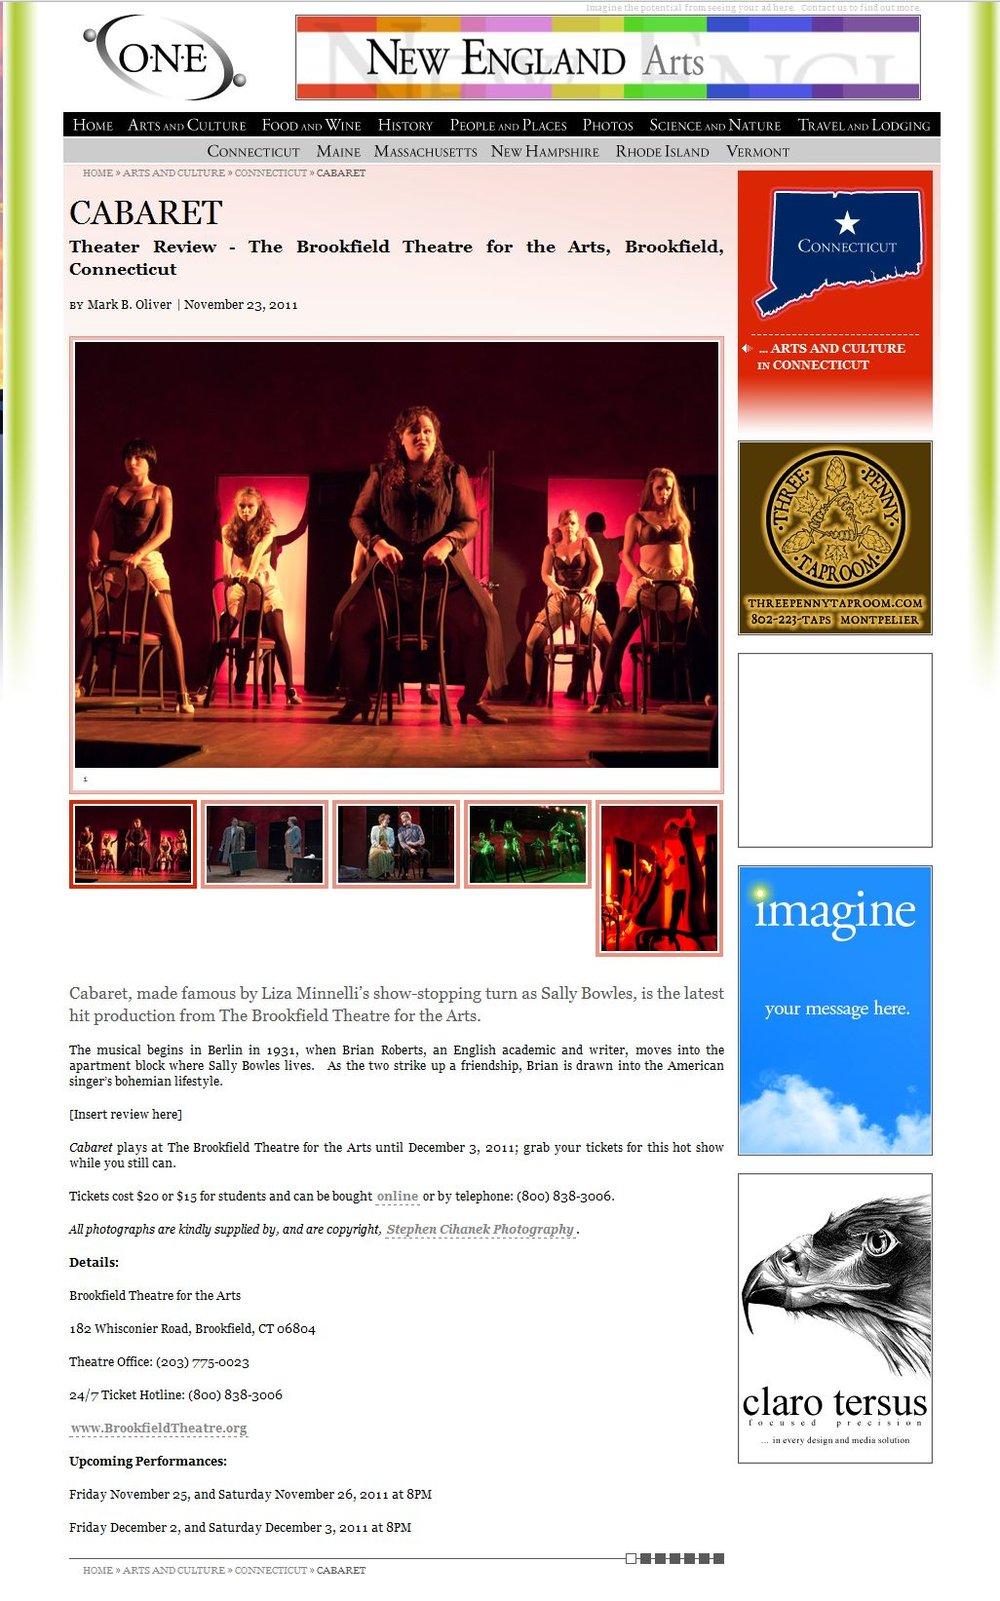 OneNewEngland-Cabaret 11-23-11.JPG